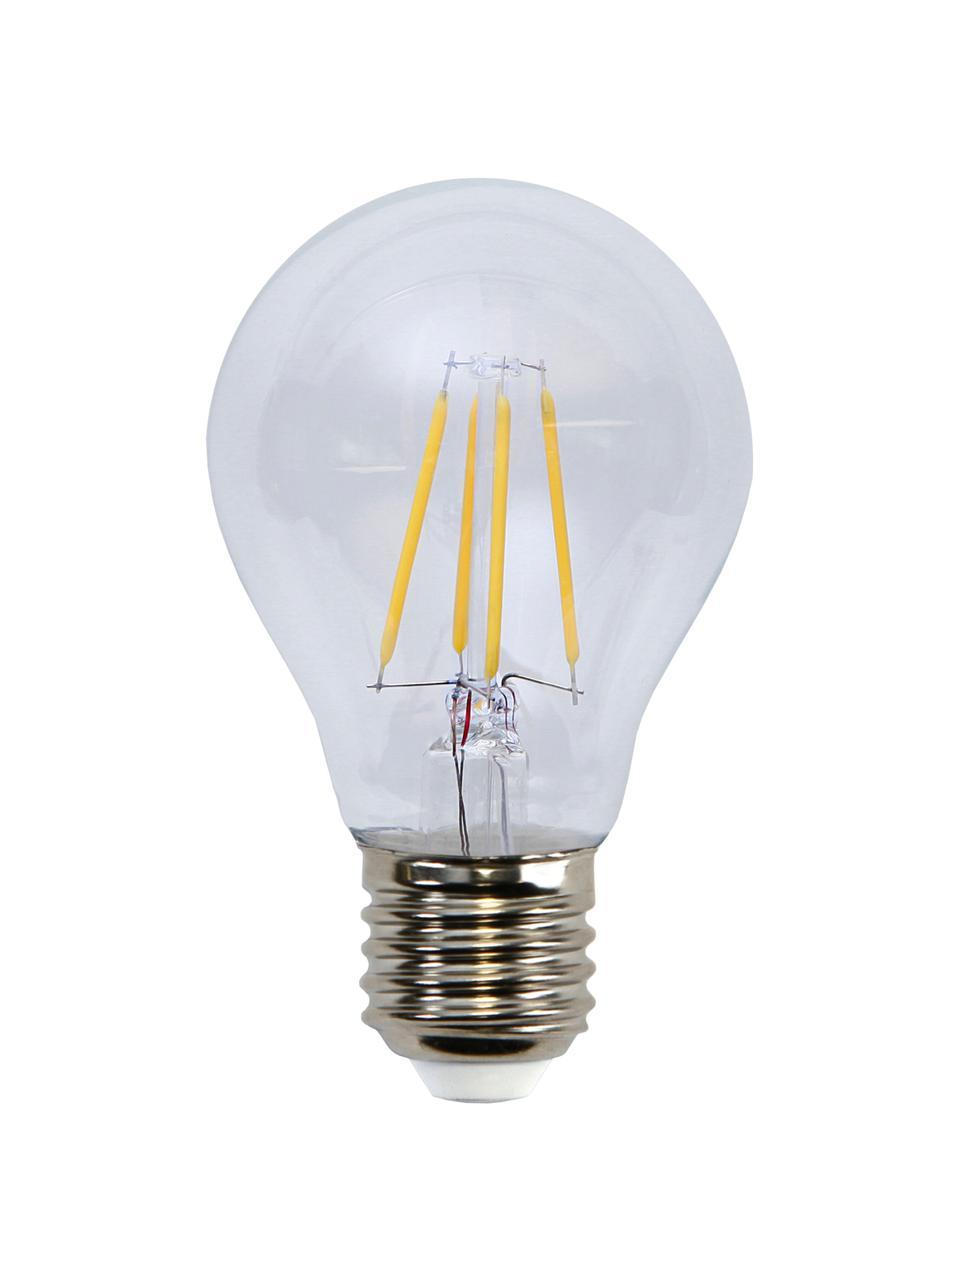 Lampadina E27, 4W, dimmerabile, bianco caldo 1 pz, Lampadina: vetro, Trasparente, Ø 6 x Alt. 11 cm